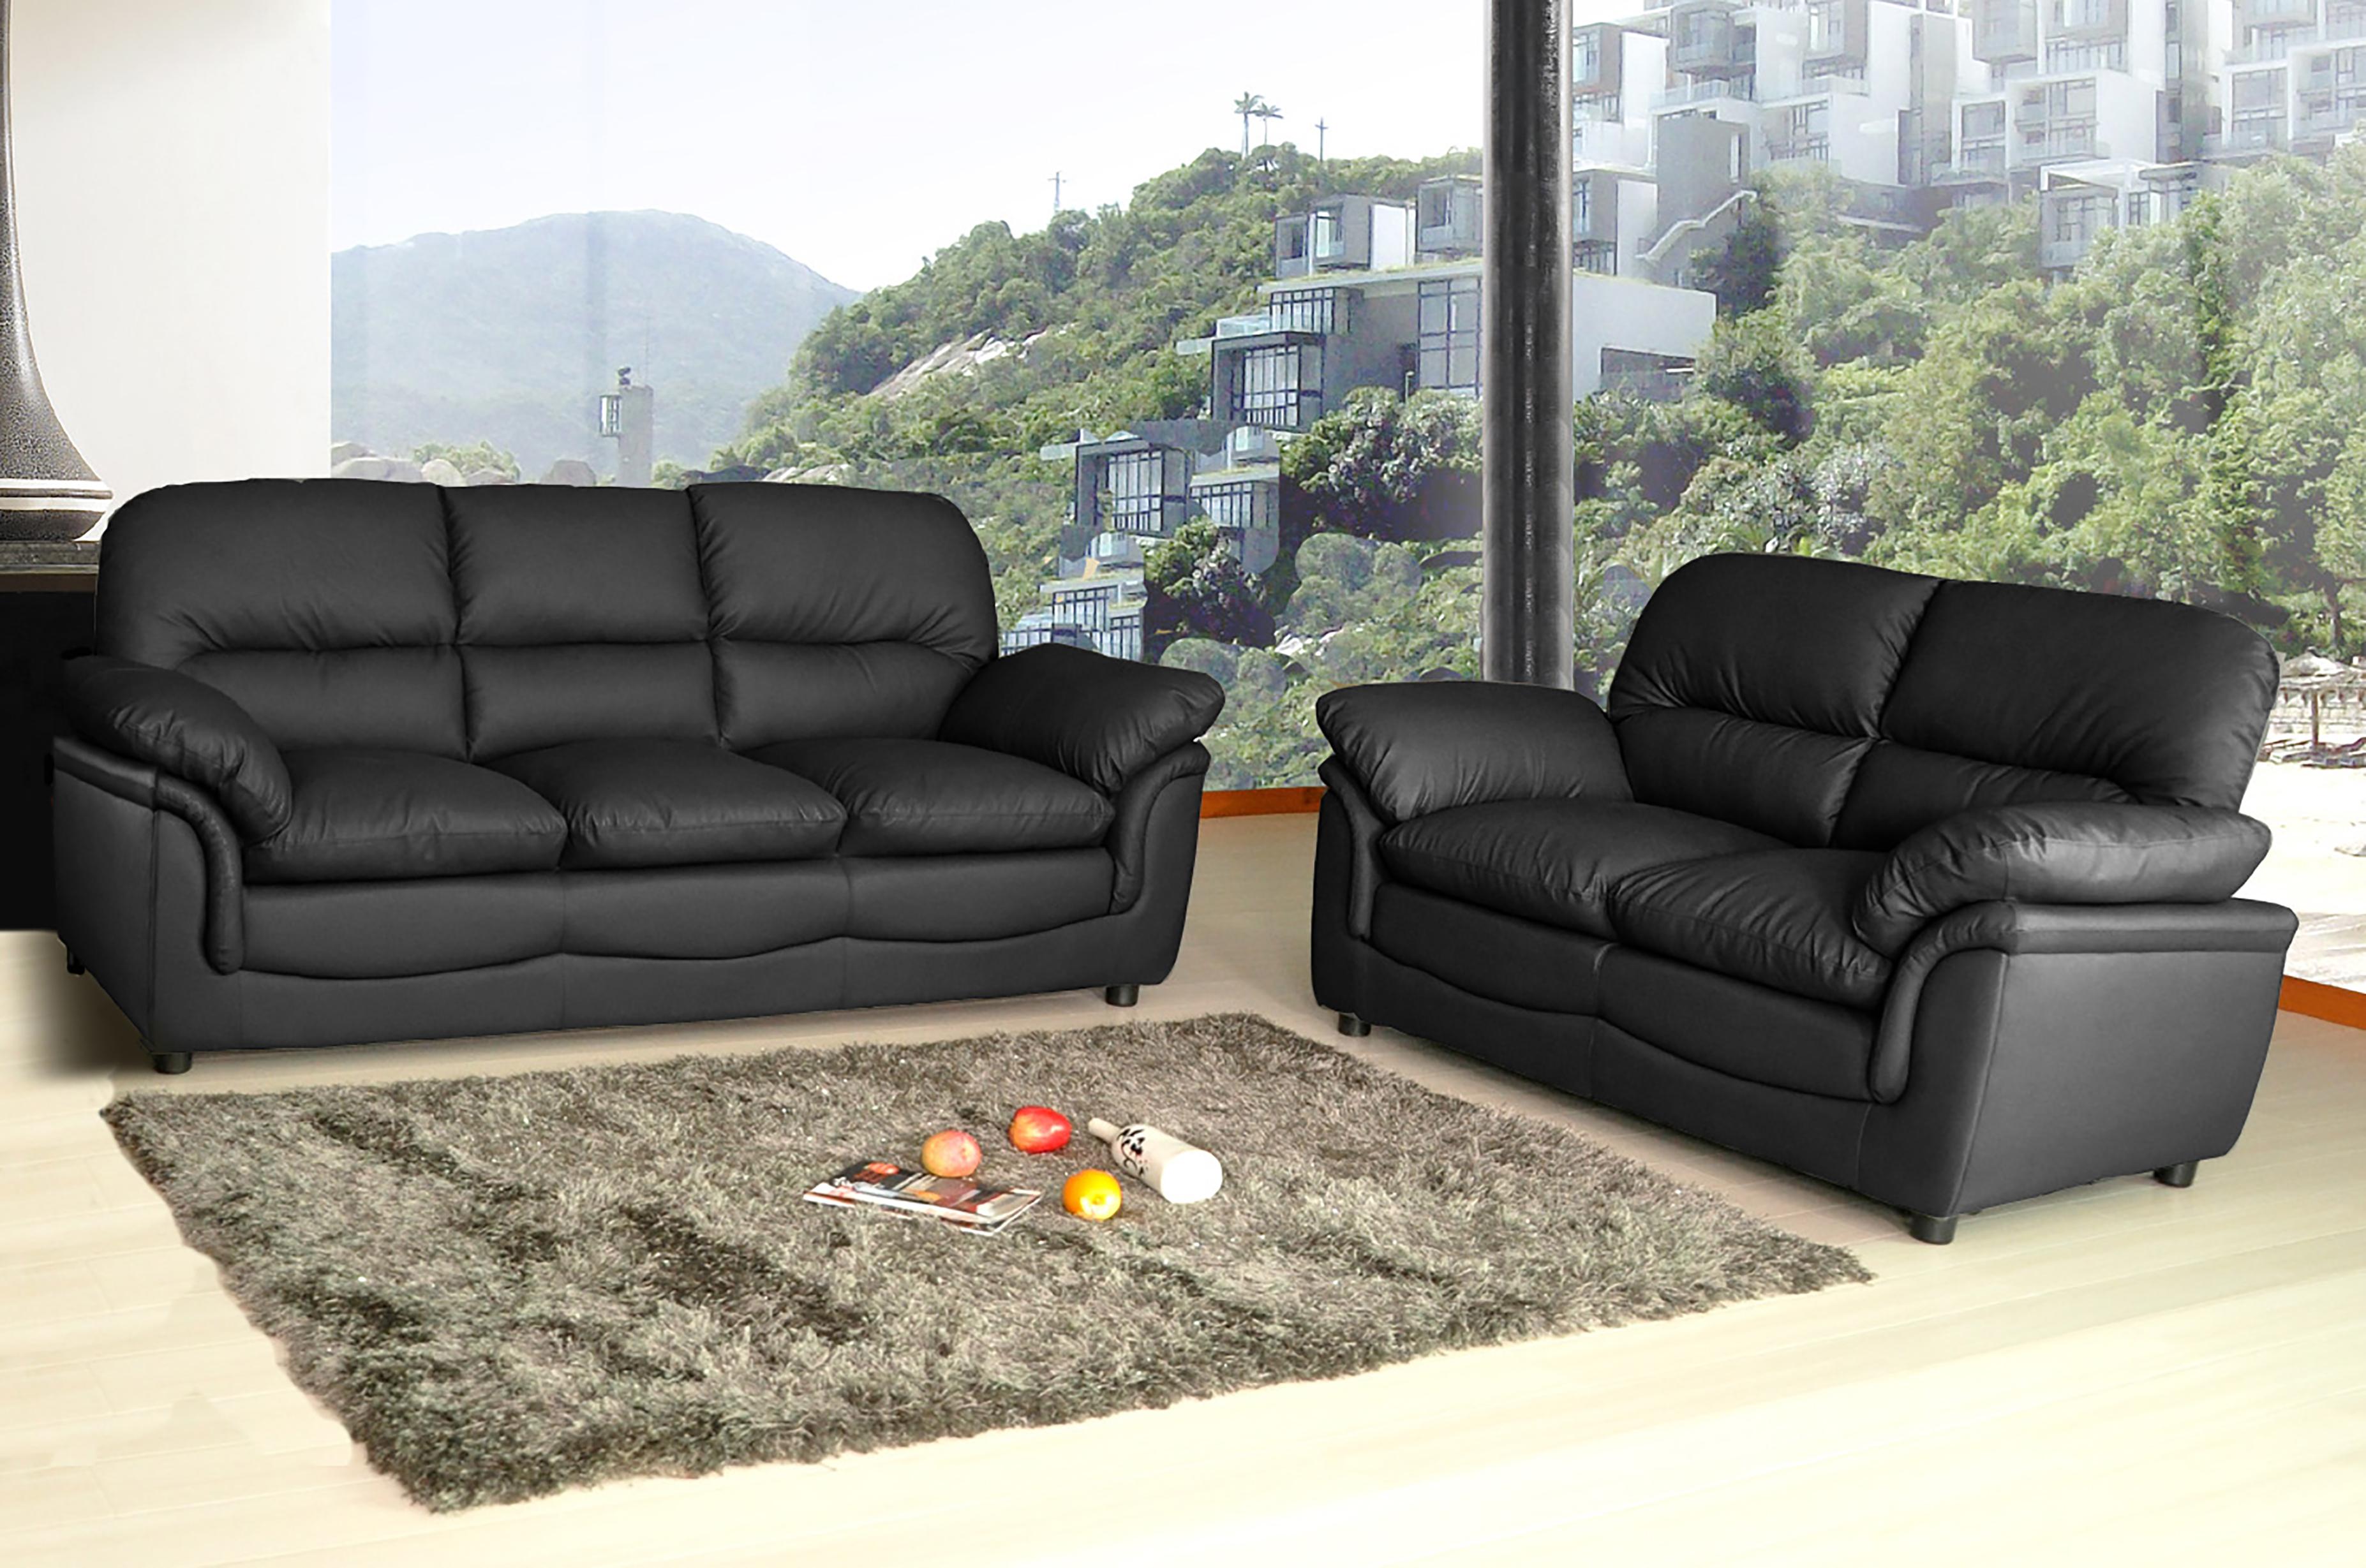 New Modern Verona Bonded Leather Sofa Suite In Black